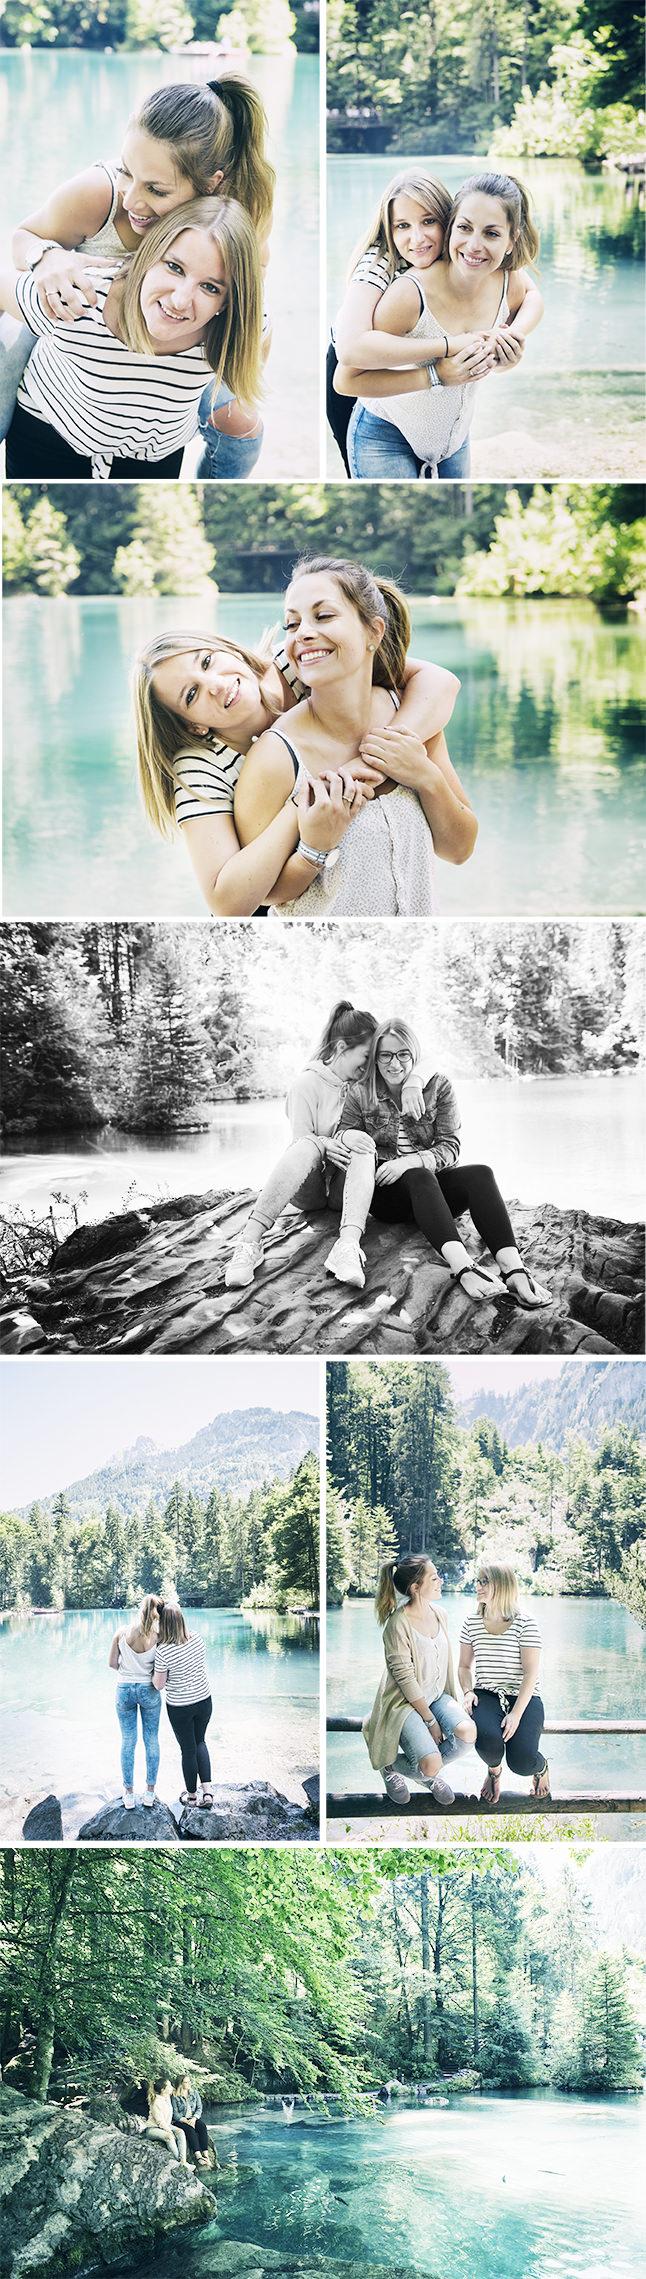 Freundinnenshooting Michèle&Julia_Fotos Noemi Tirro